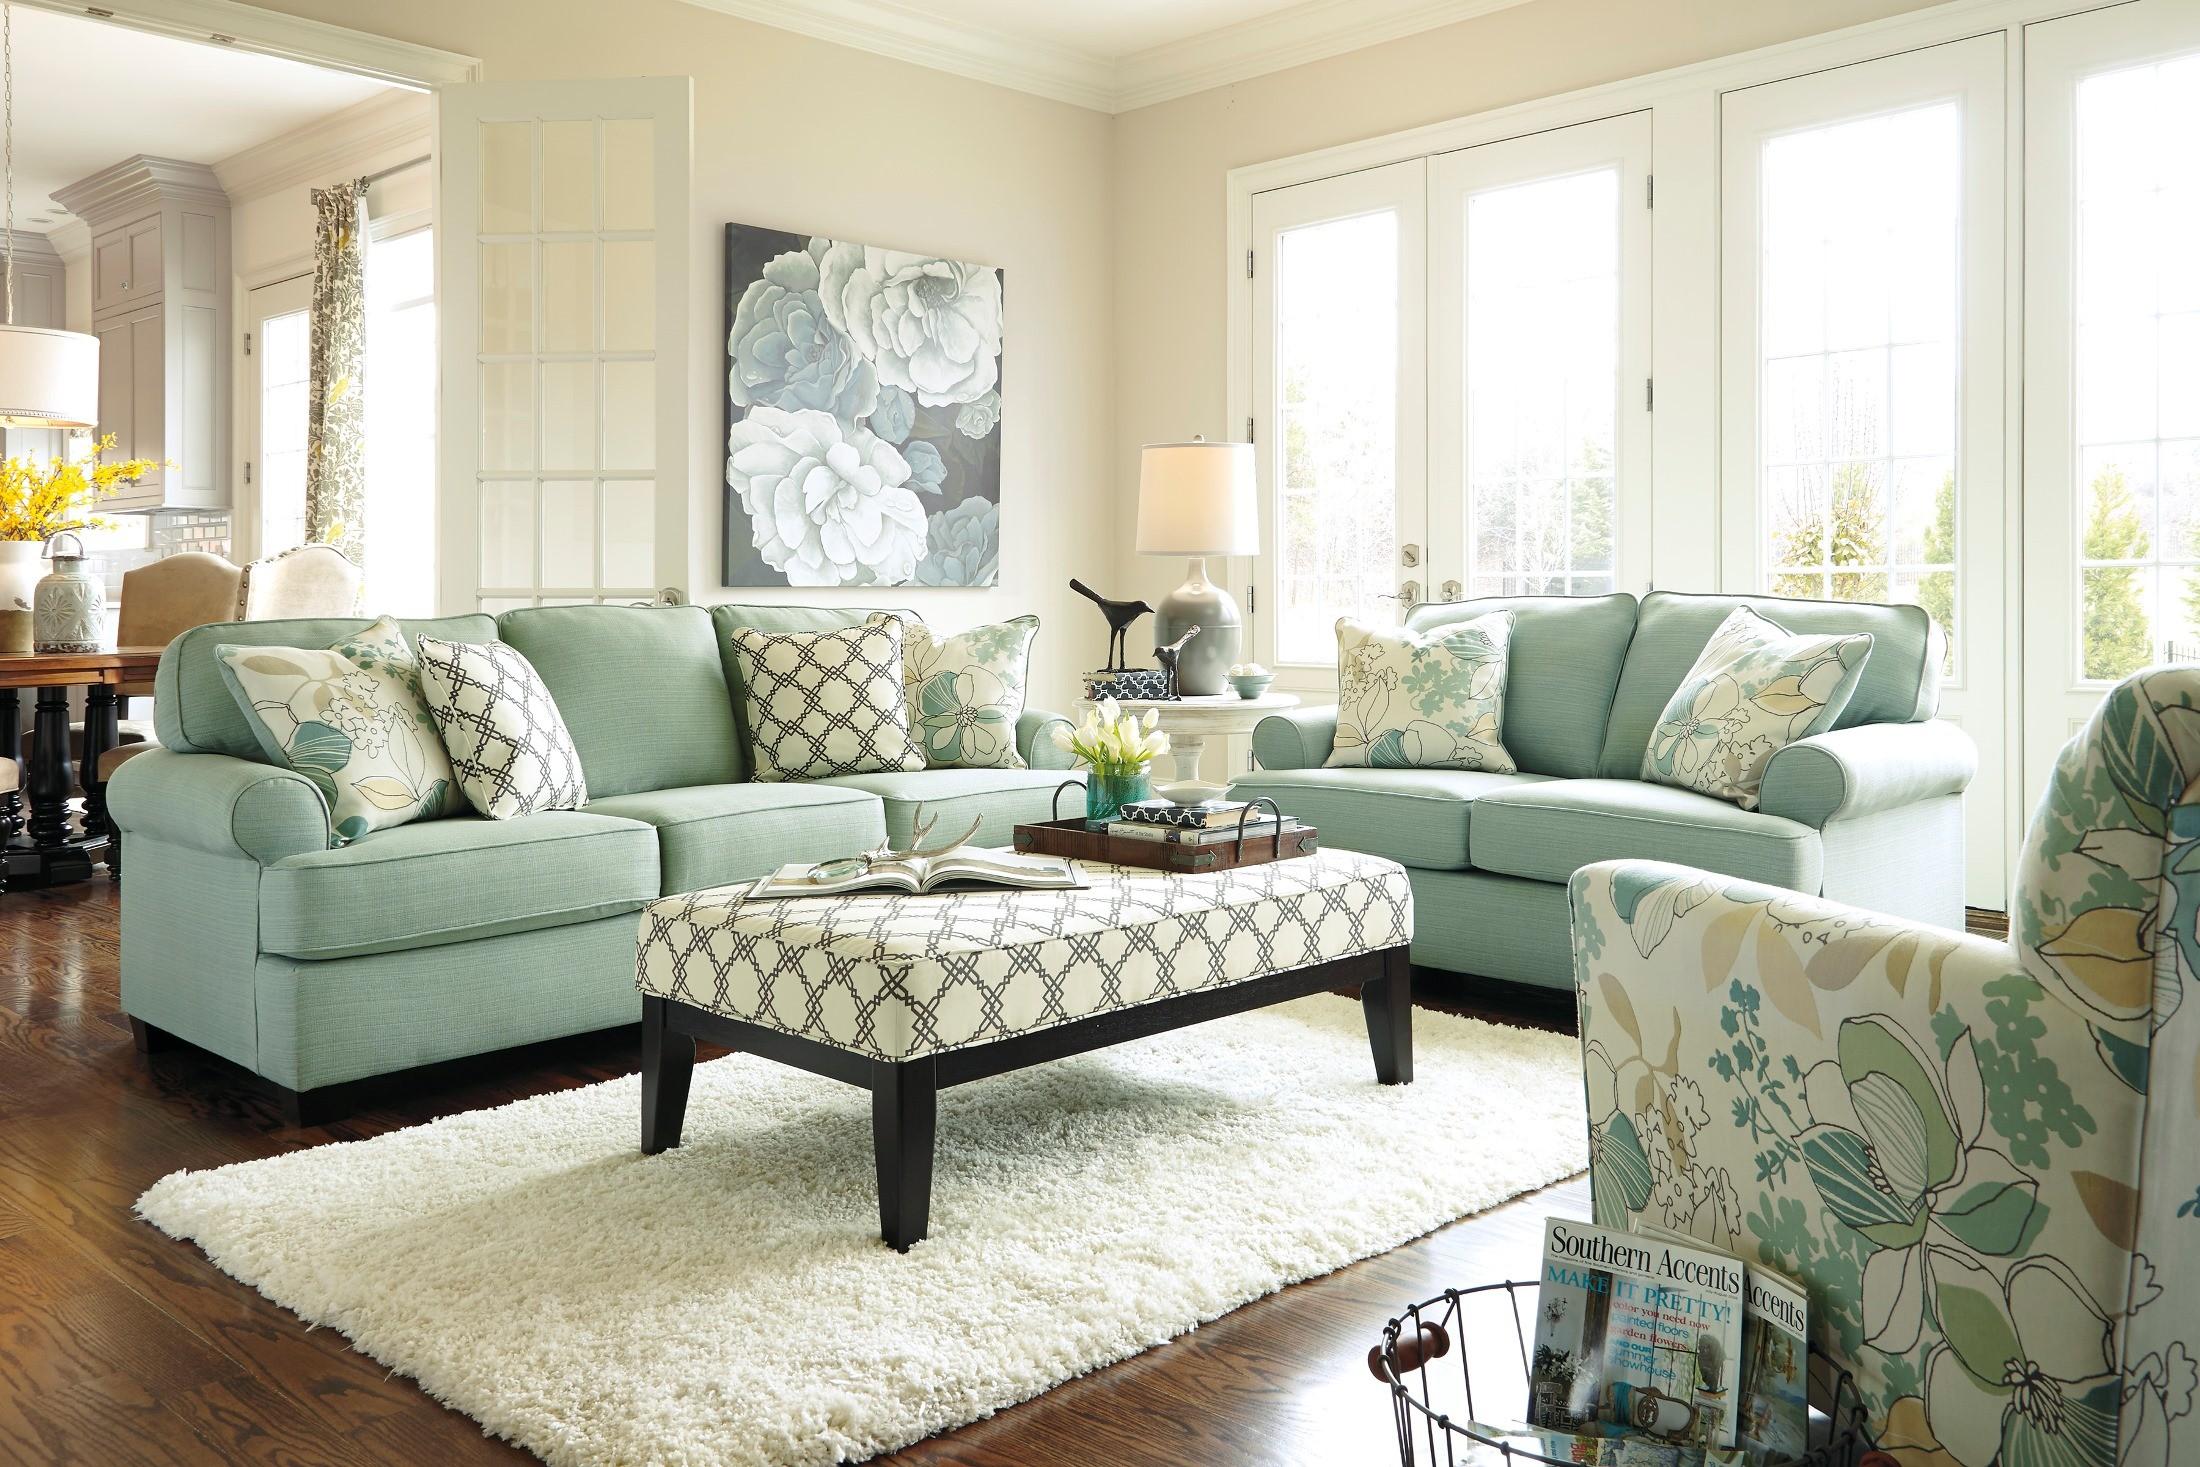 Daystar Living Room Set from Ashley 282003835